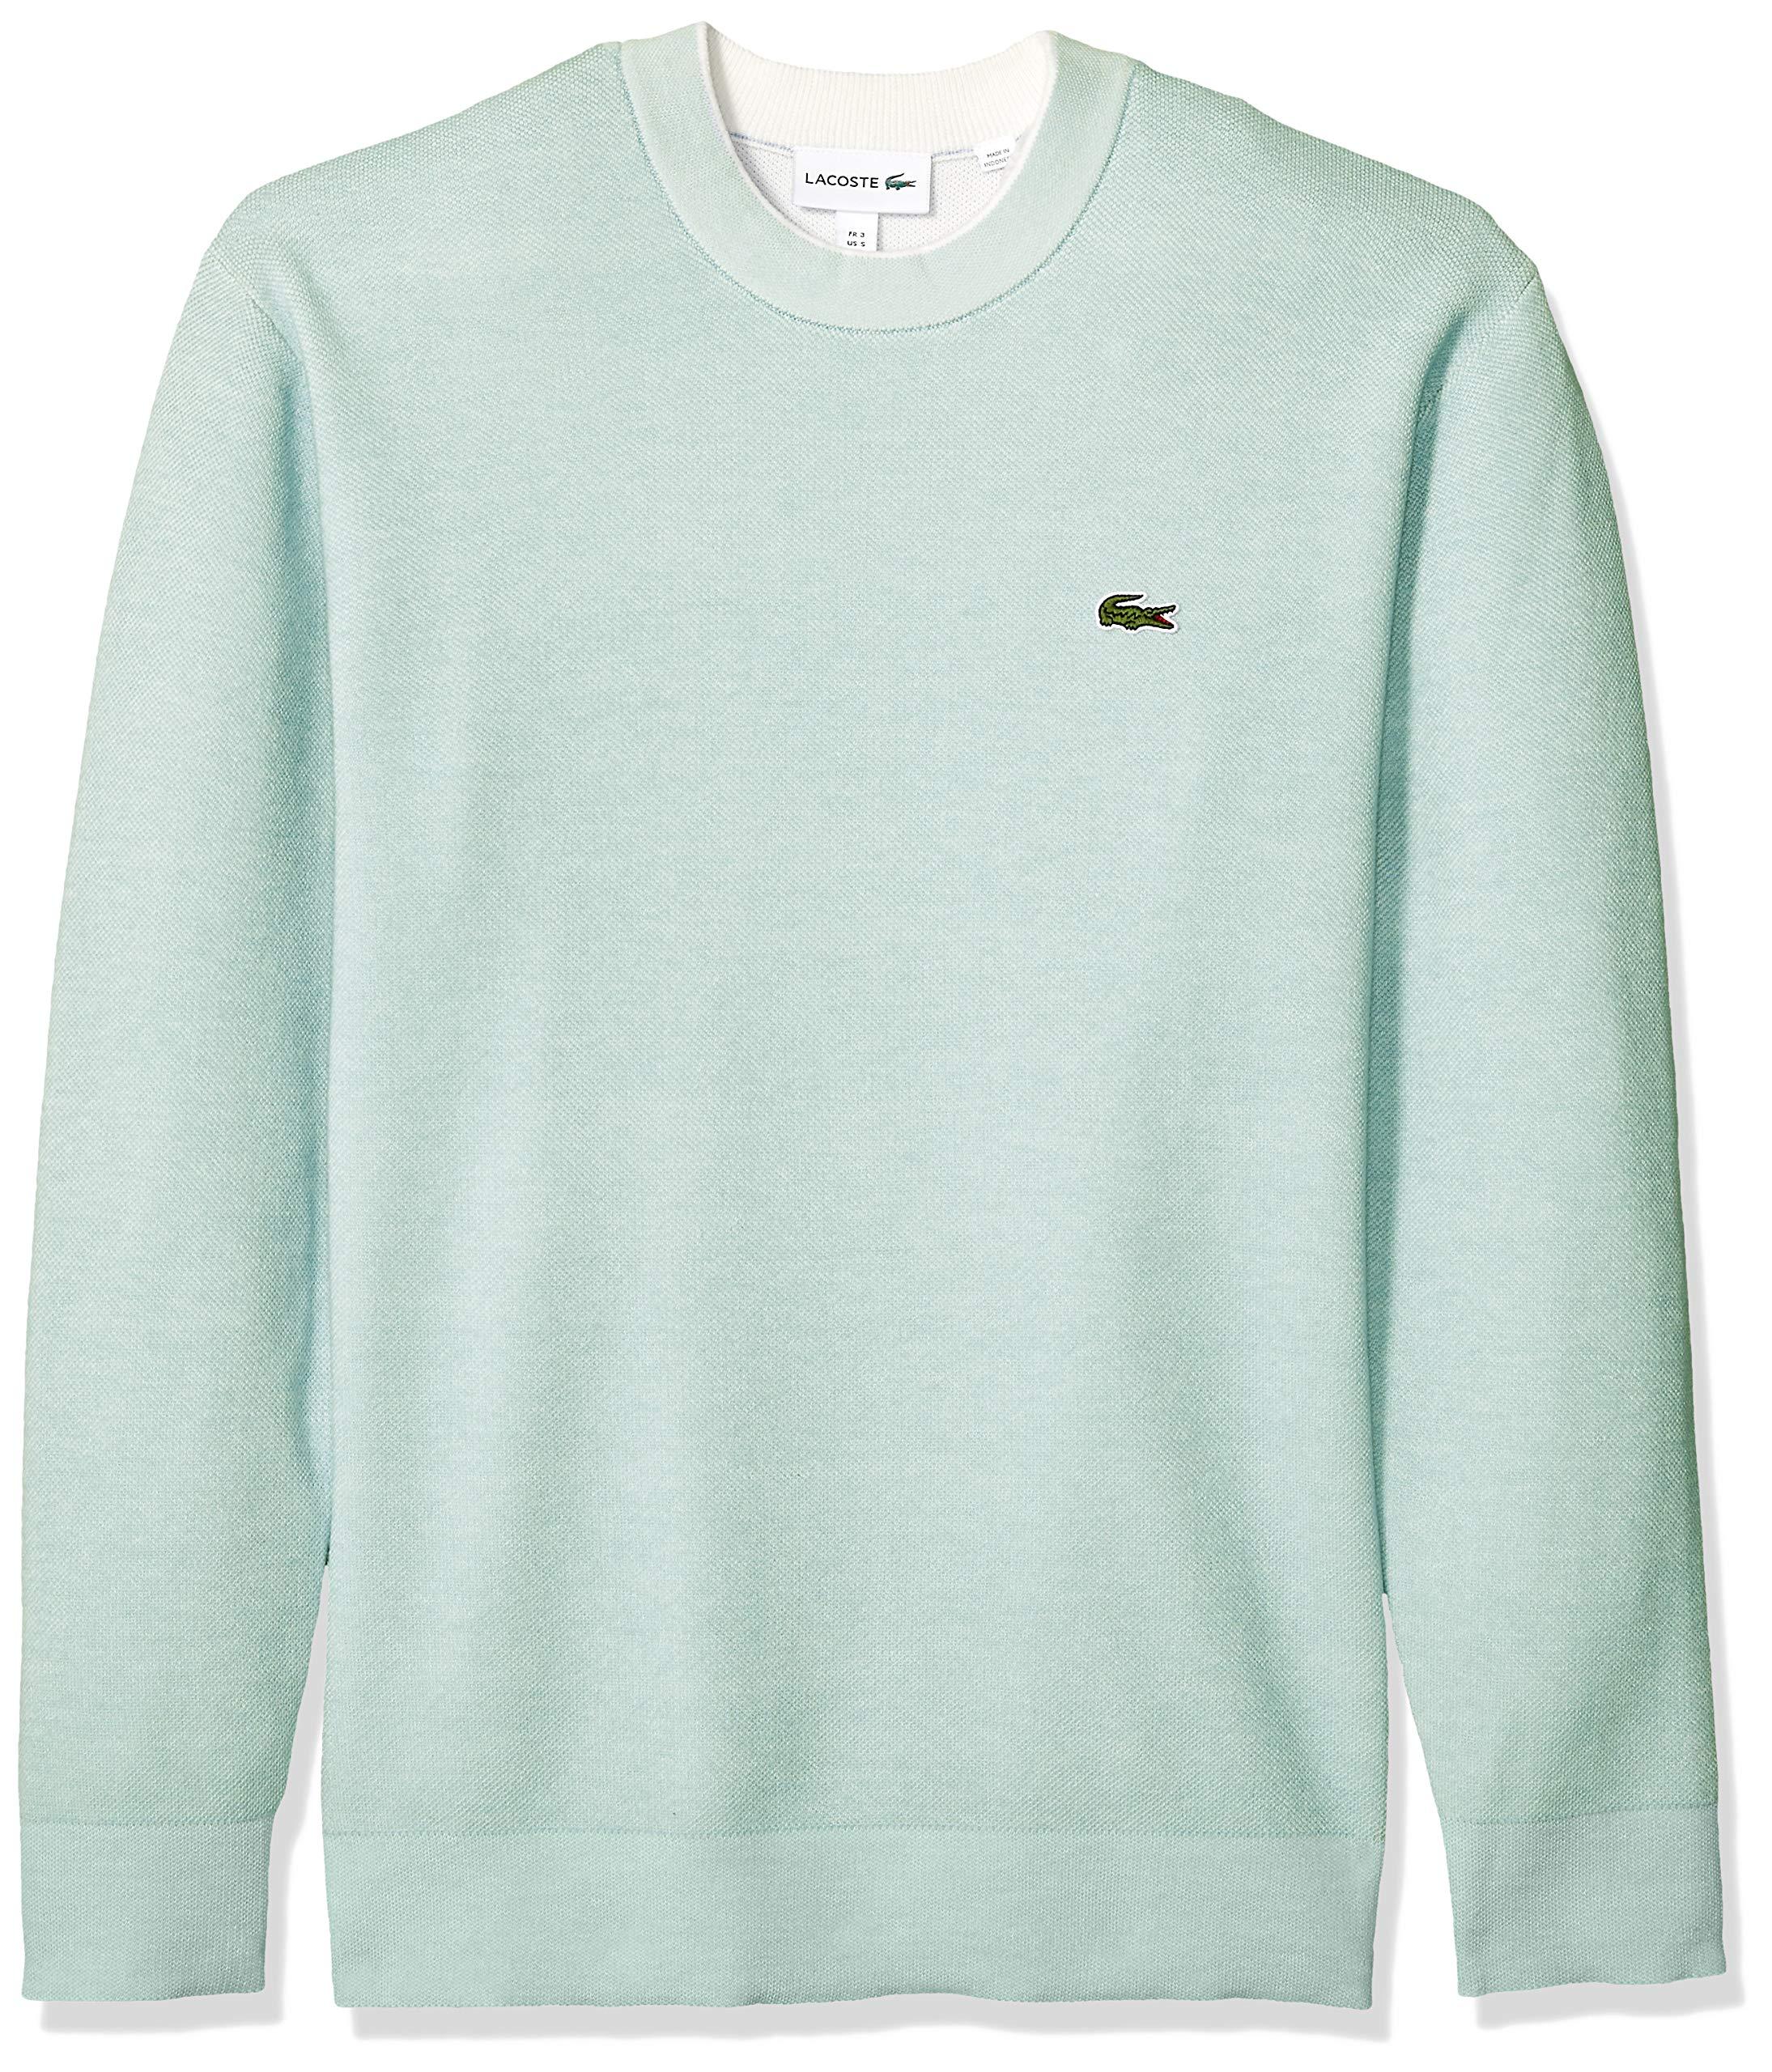 Lacoste Men's Long Sleeve BI-Colour Bird's Eye PIN Striped Sweater, ASPERA/Flour, Medium